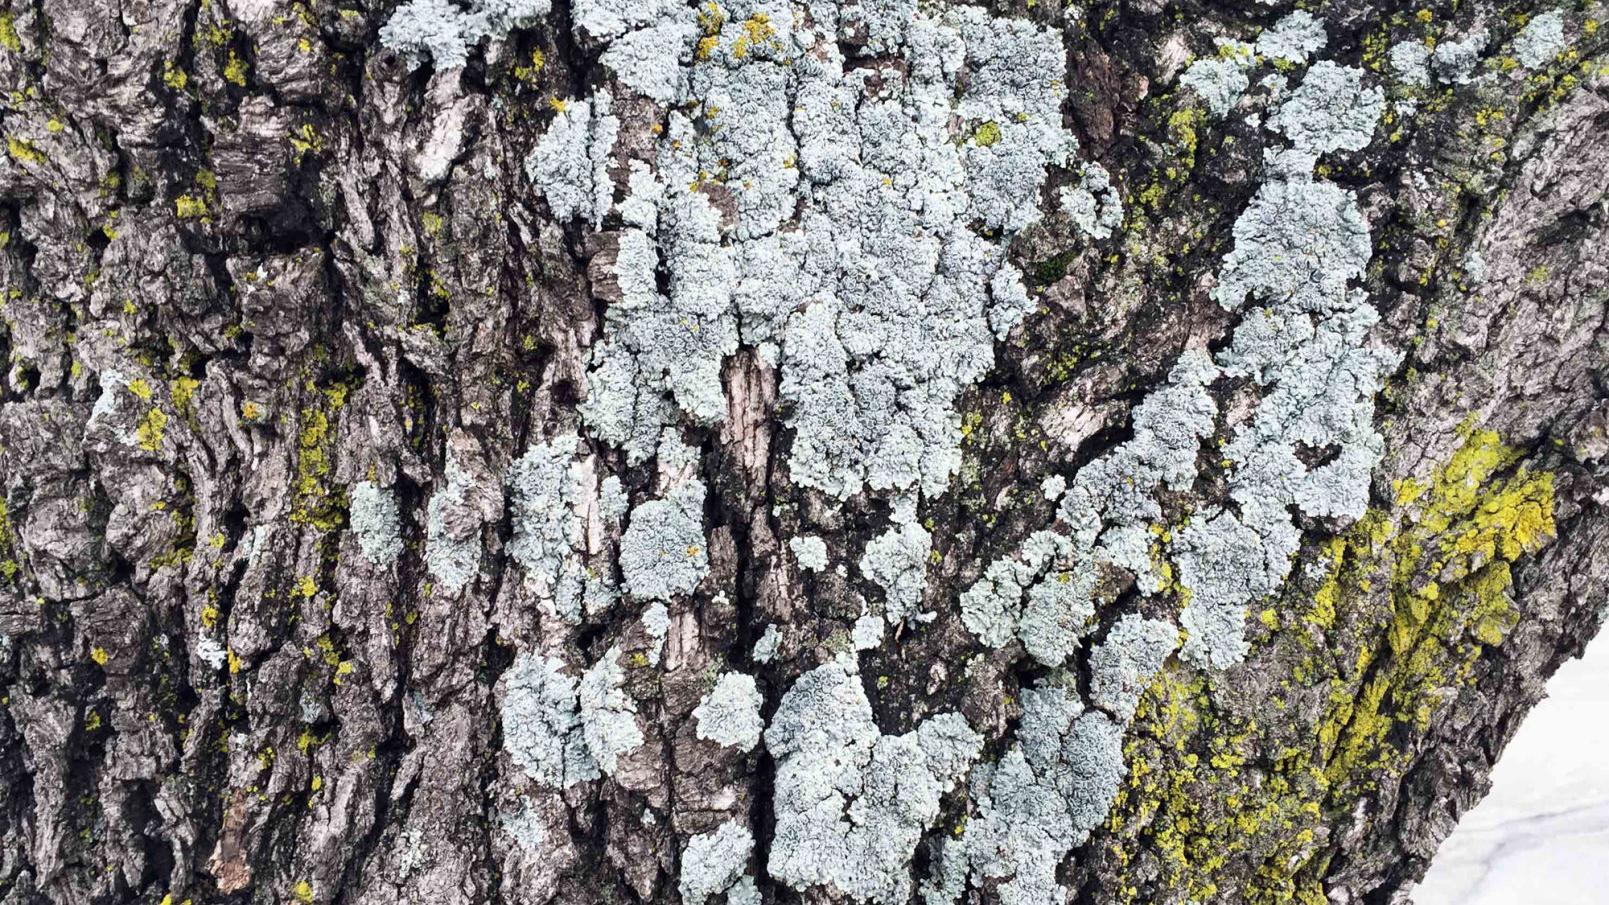 Texas Gardening Arborist Should Check Pecan Tree Shedding Lichens Brazos Life Theeagle Com